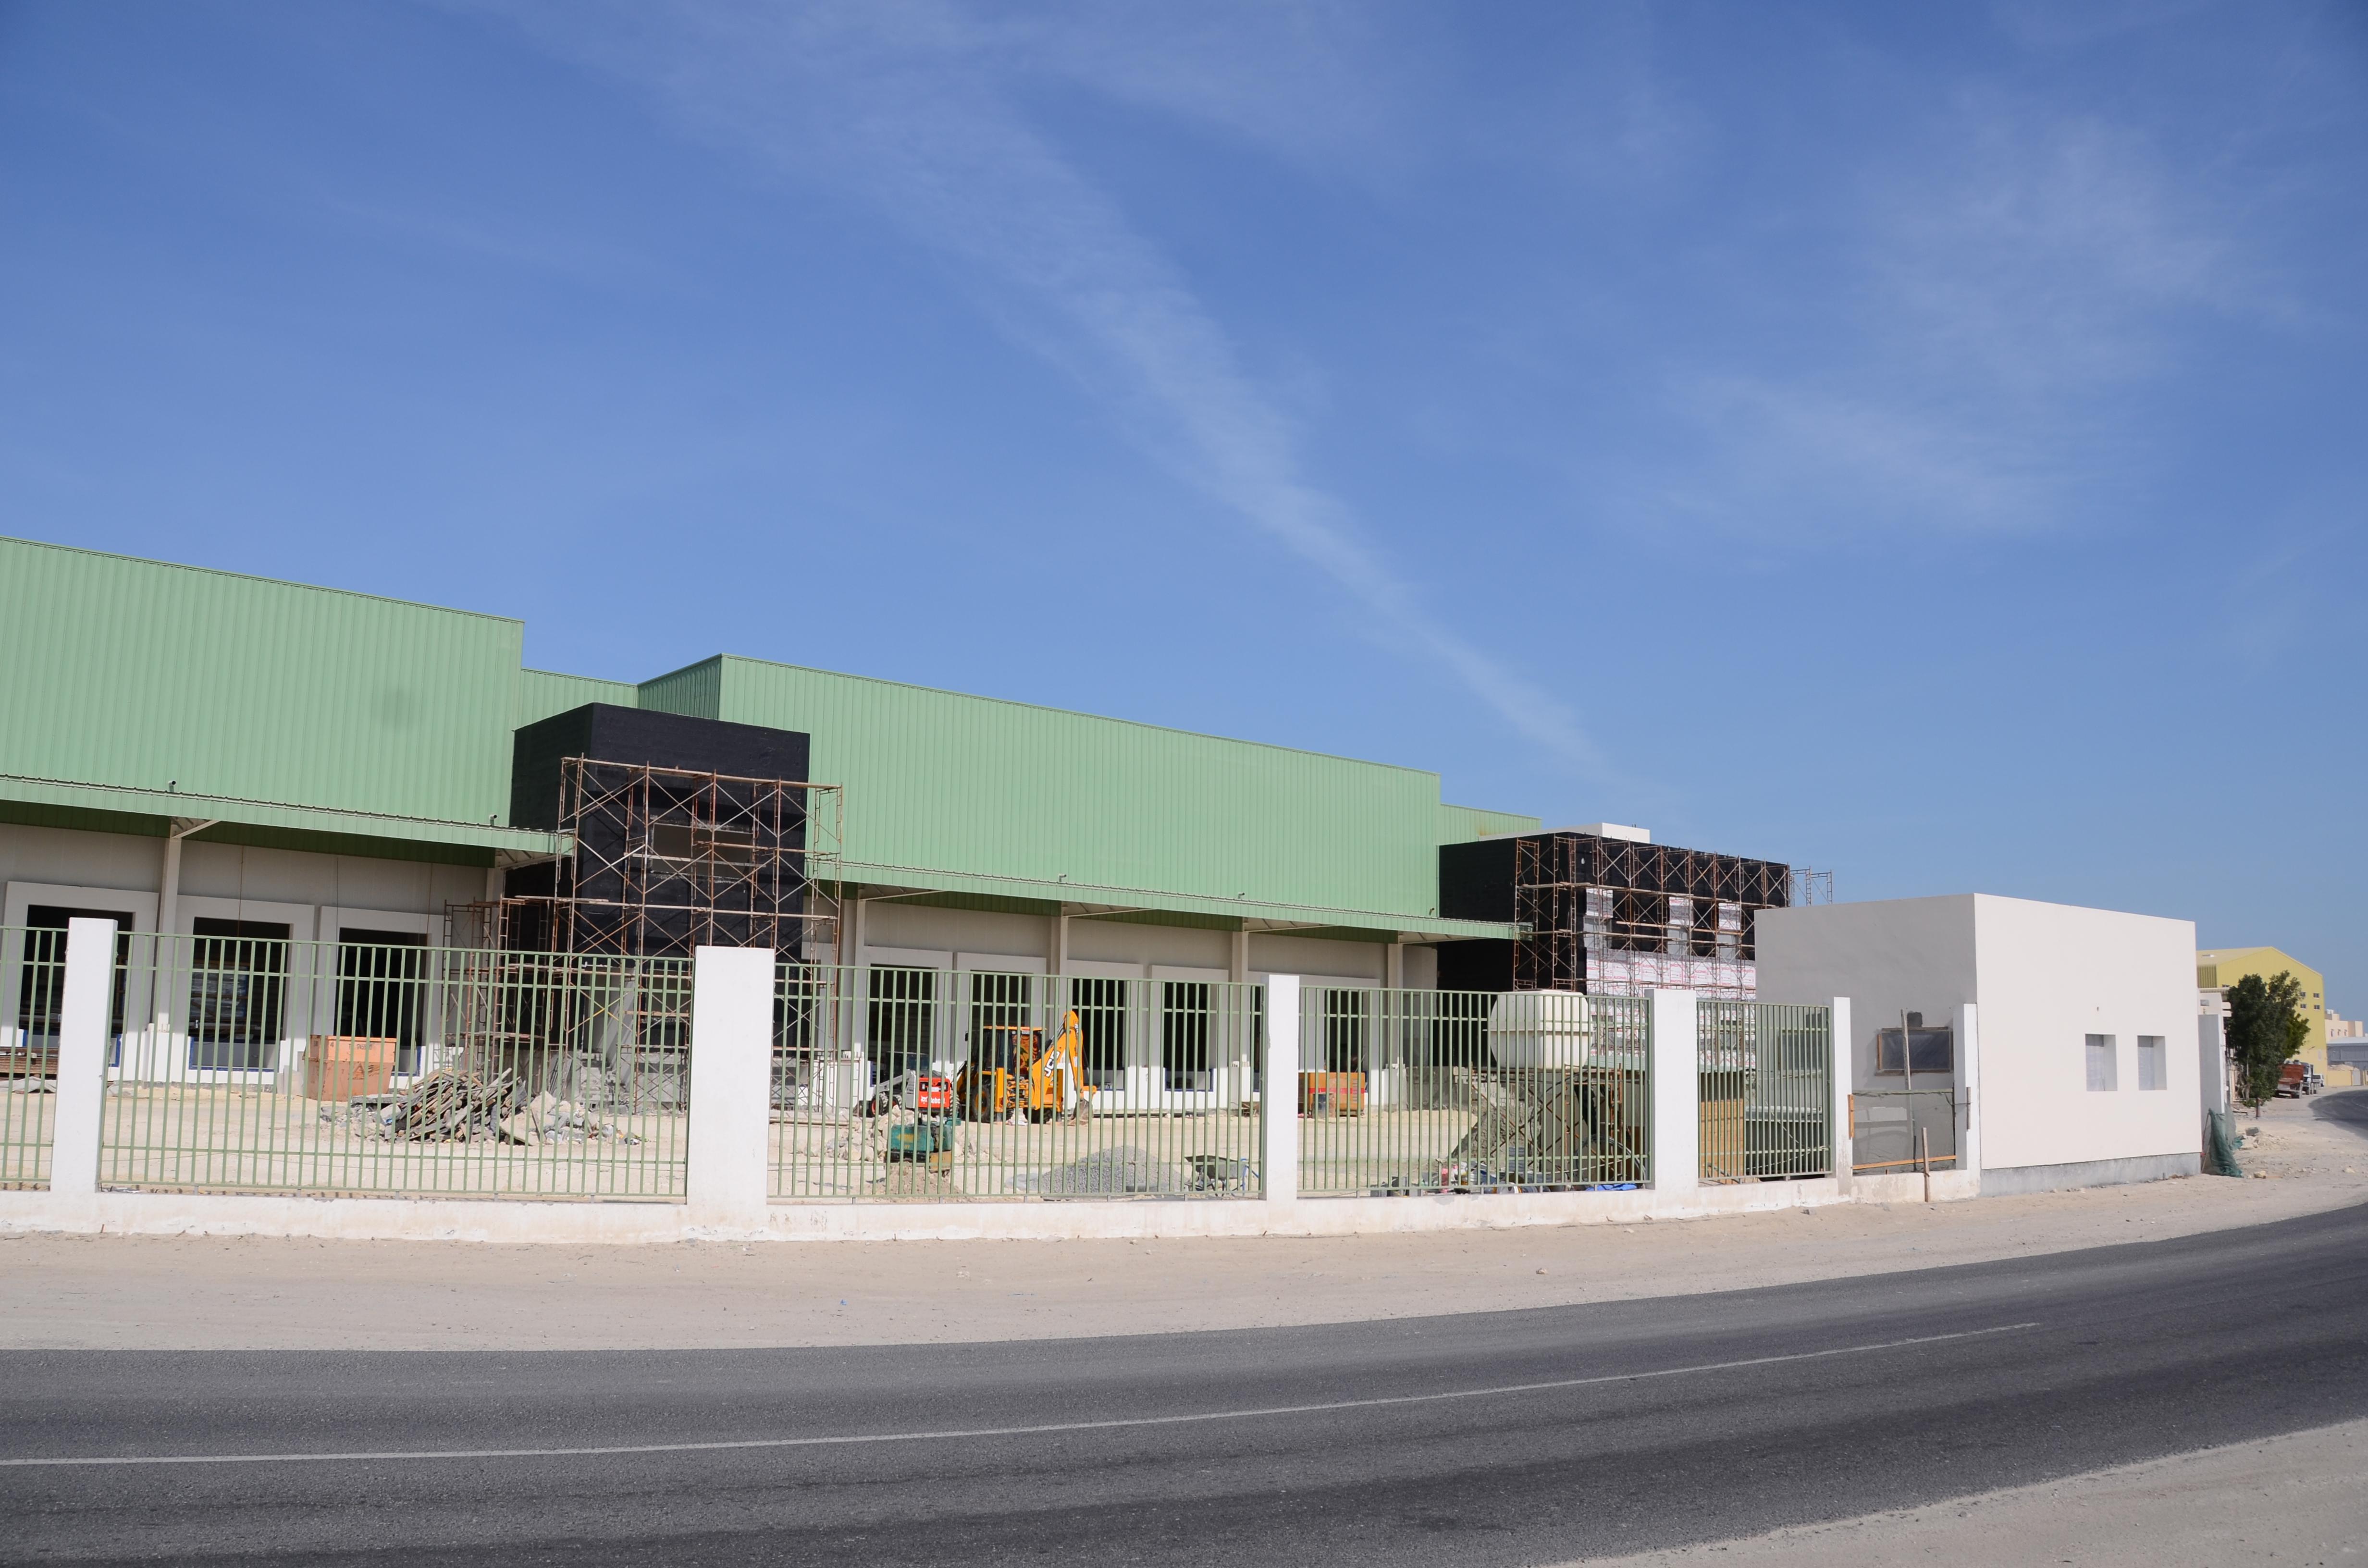 Front Gate - Under Construction